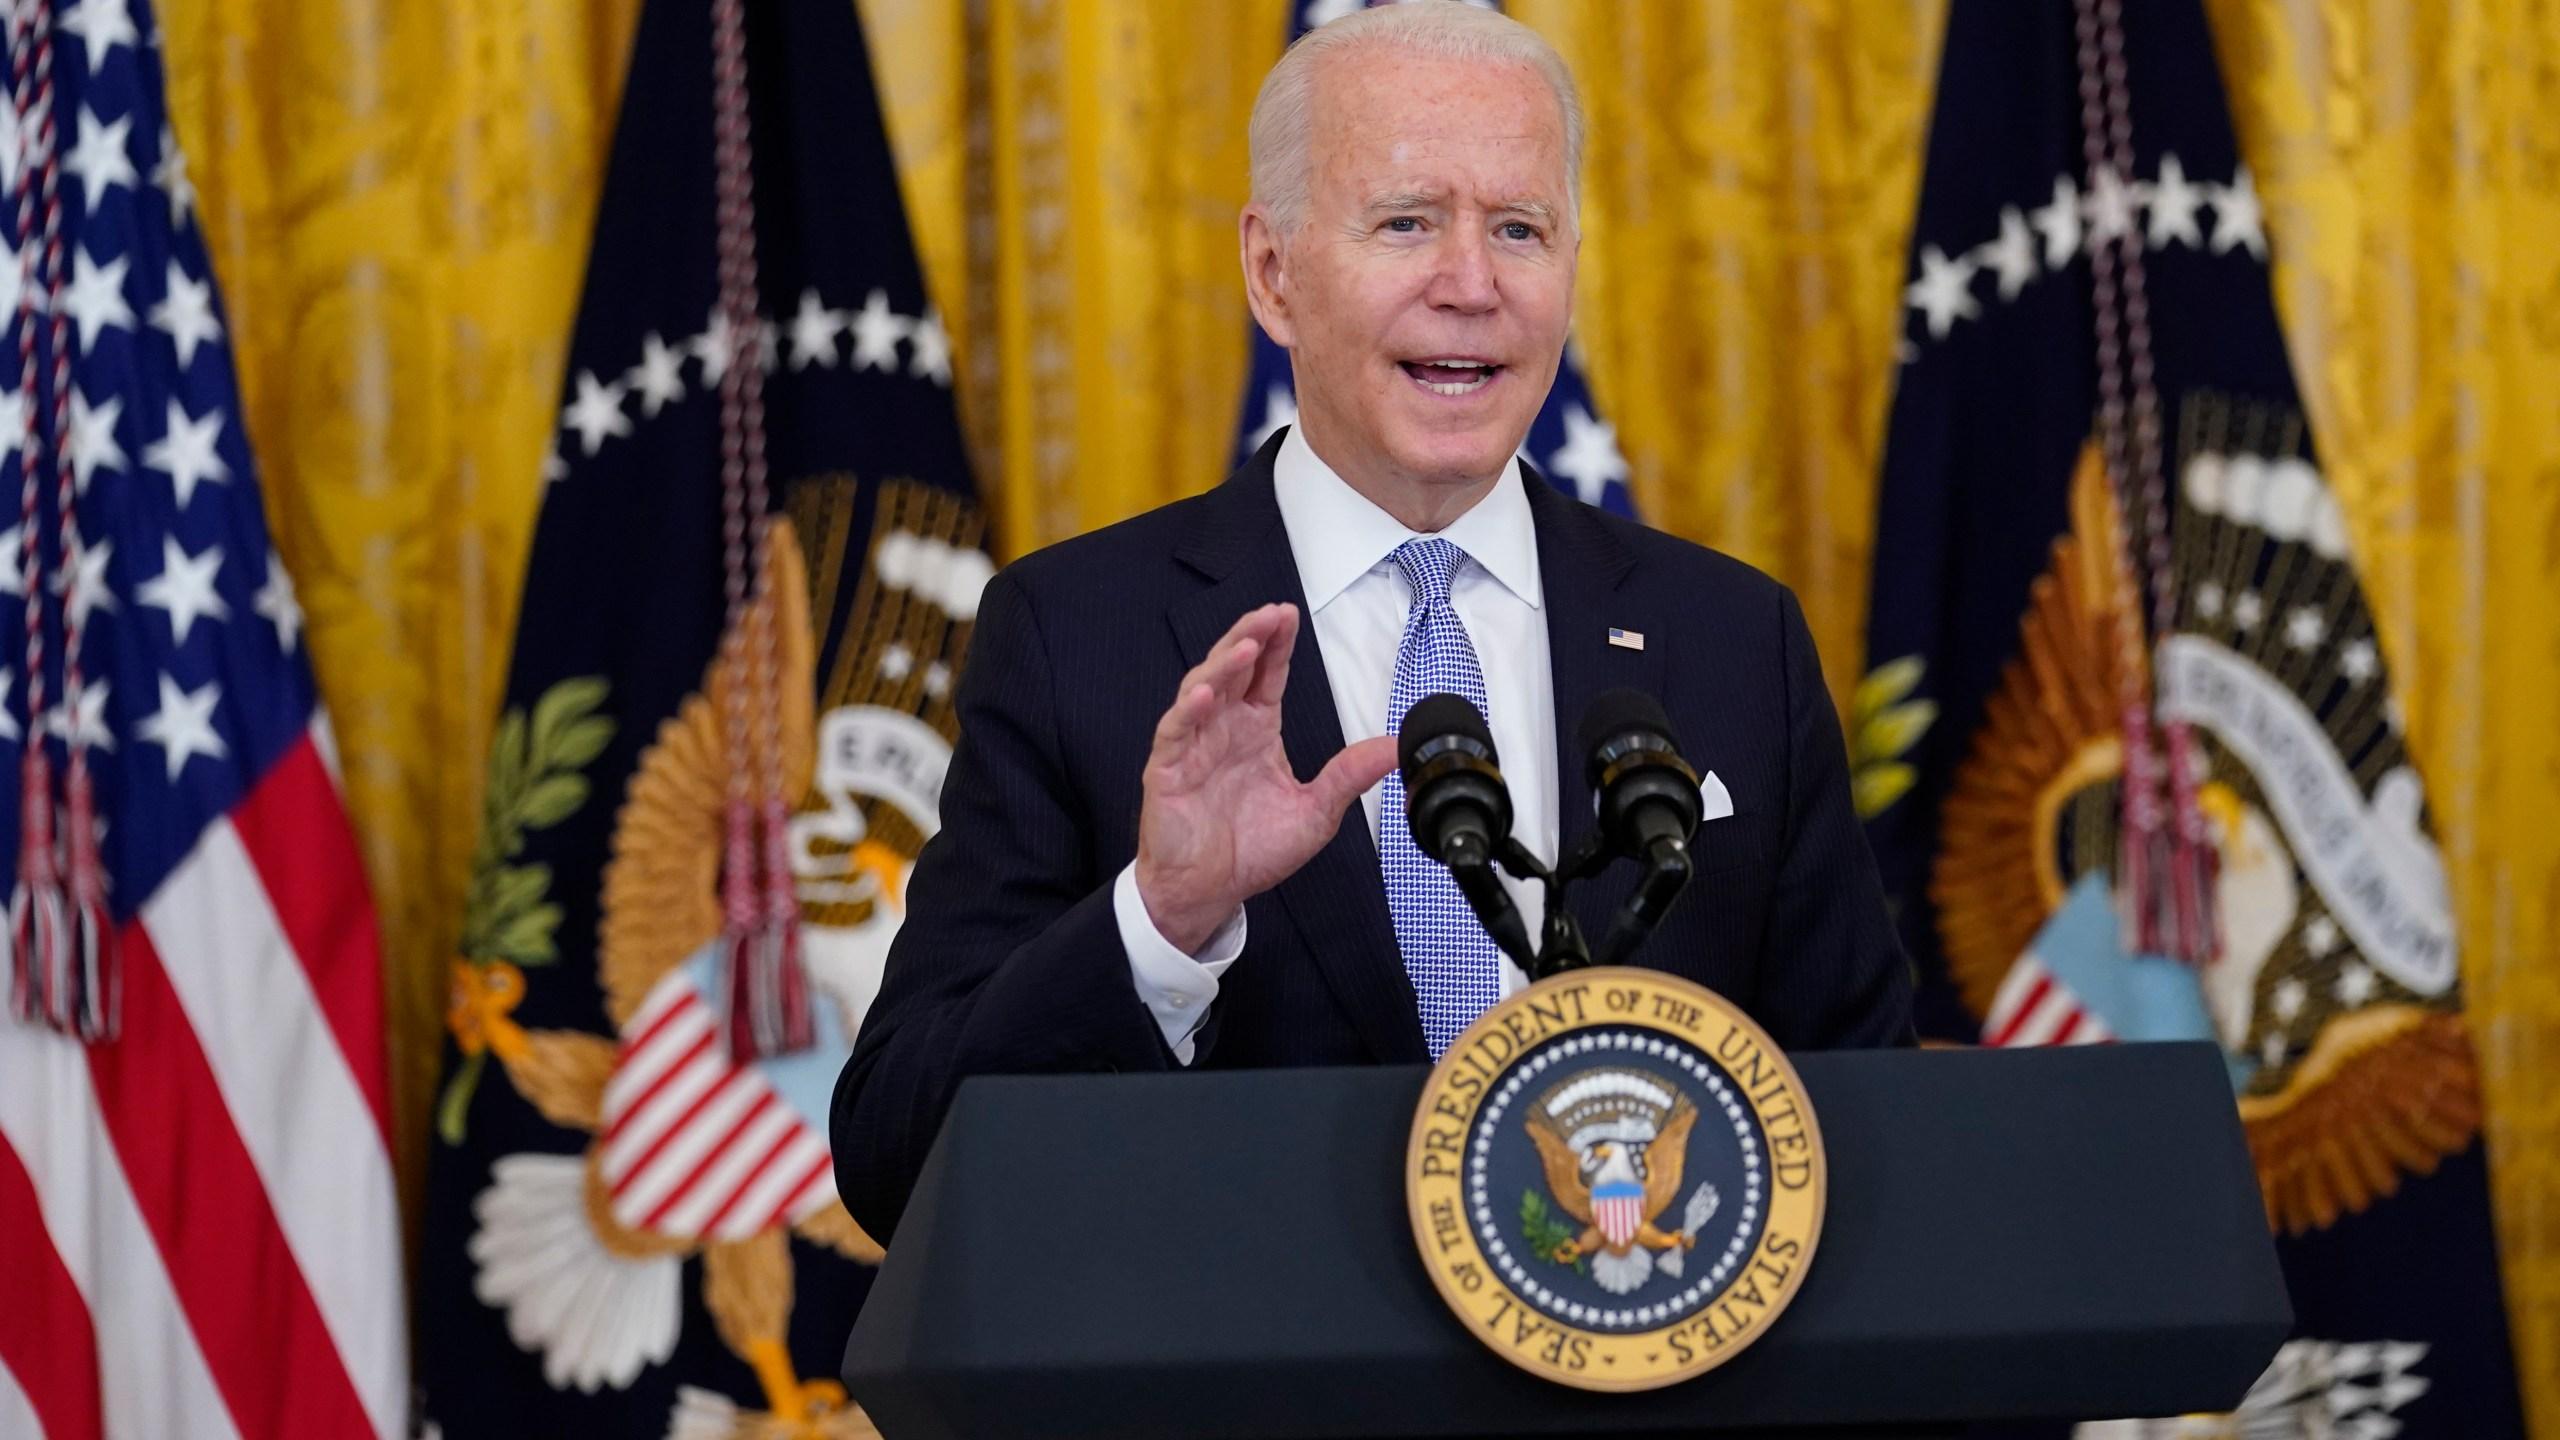 President Joe Biden speaks in the East Room of the White House on July 29, 2021. (Susan Walsh/Associated Press)